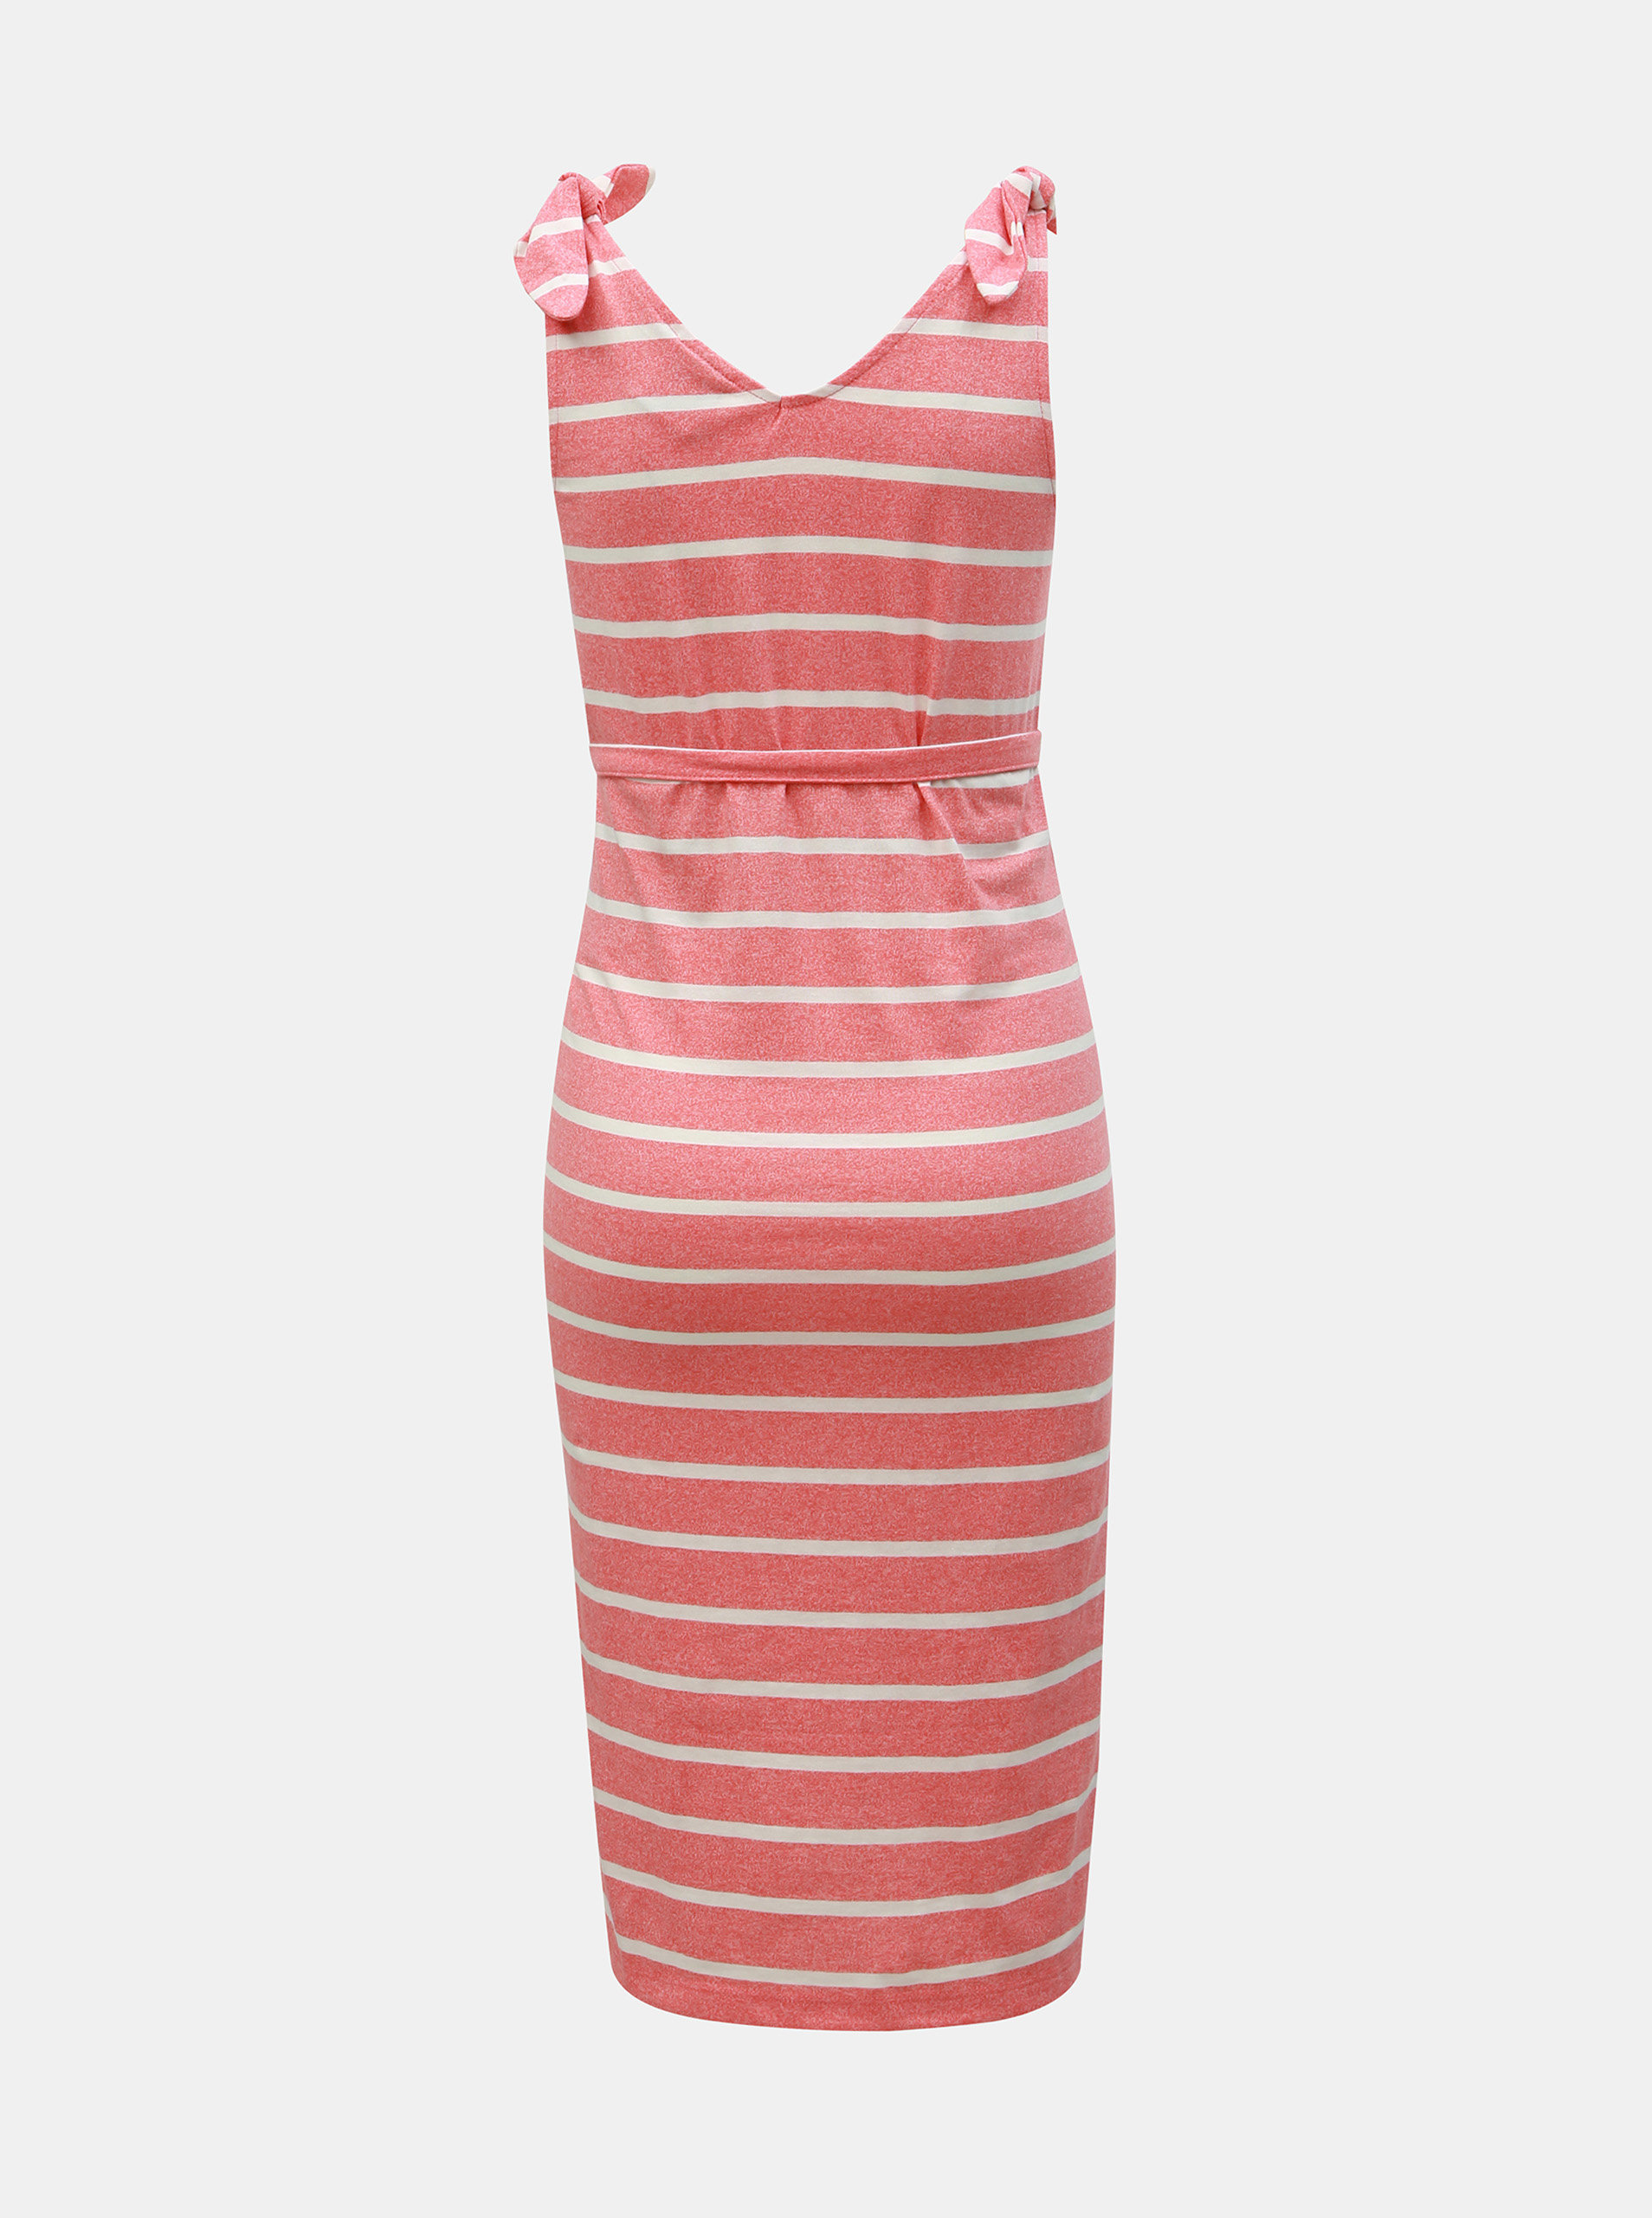 dcfab9cfc835 Ružové tehotenské pruhované šaty Mama.licious Annetta ...